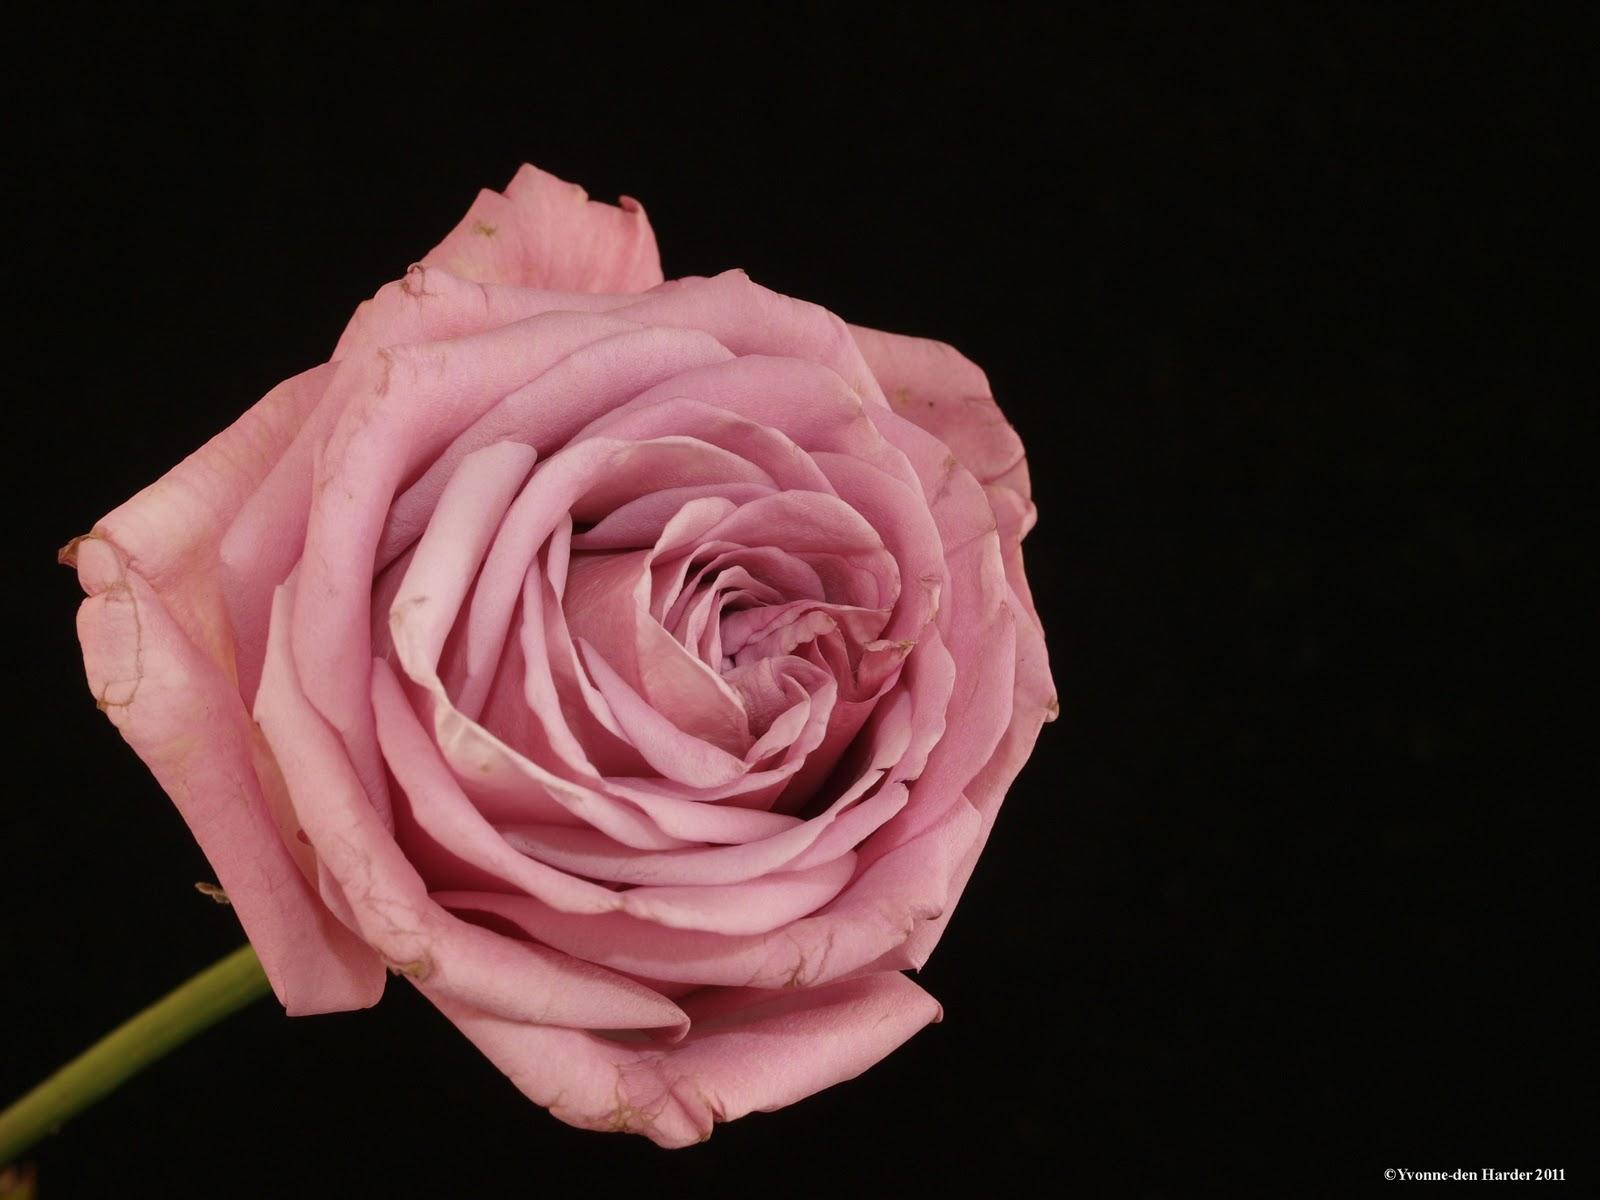 Geliefde Yvonne's foto blog: mooie bloemen &VR88